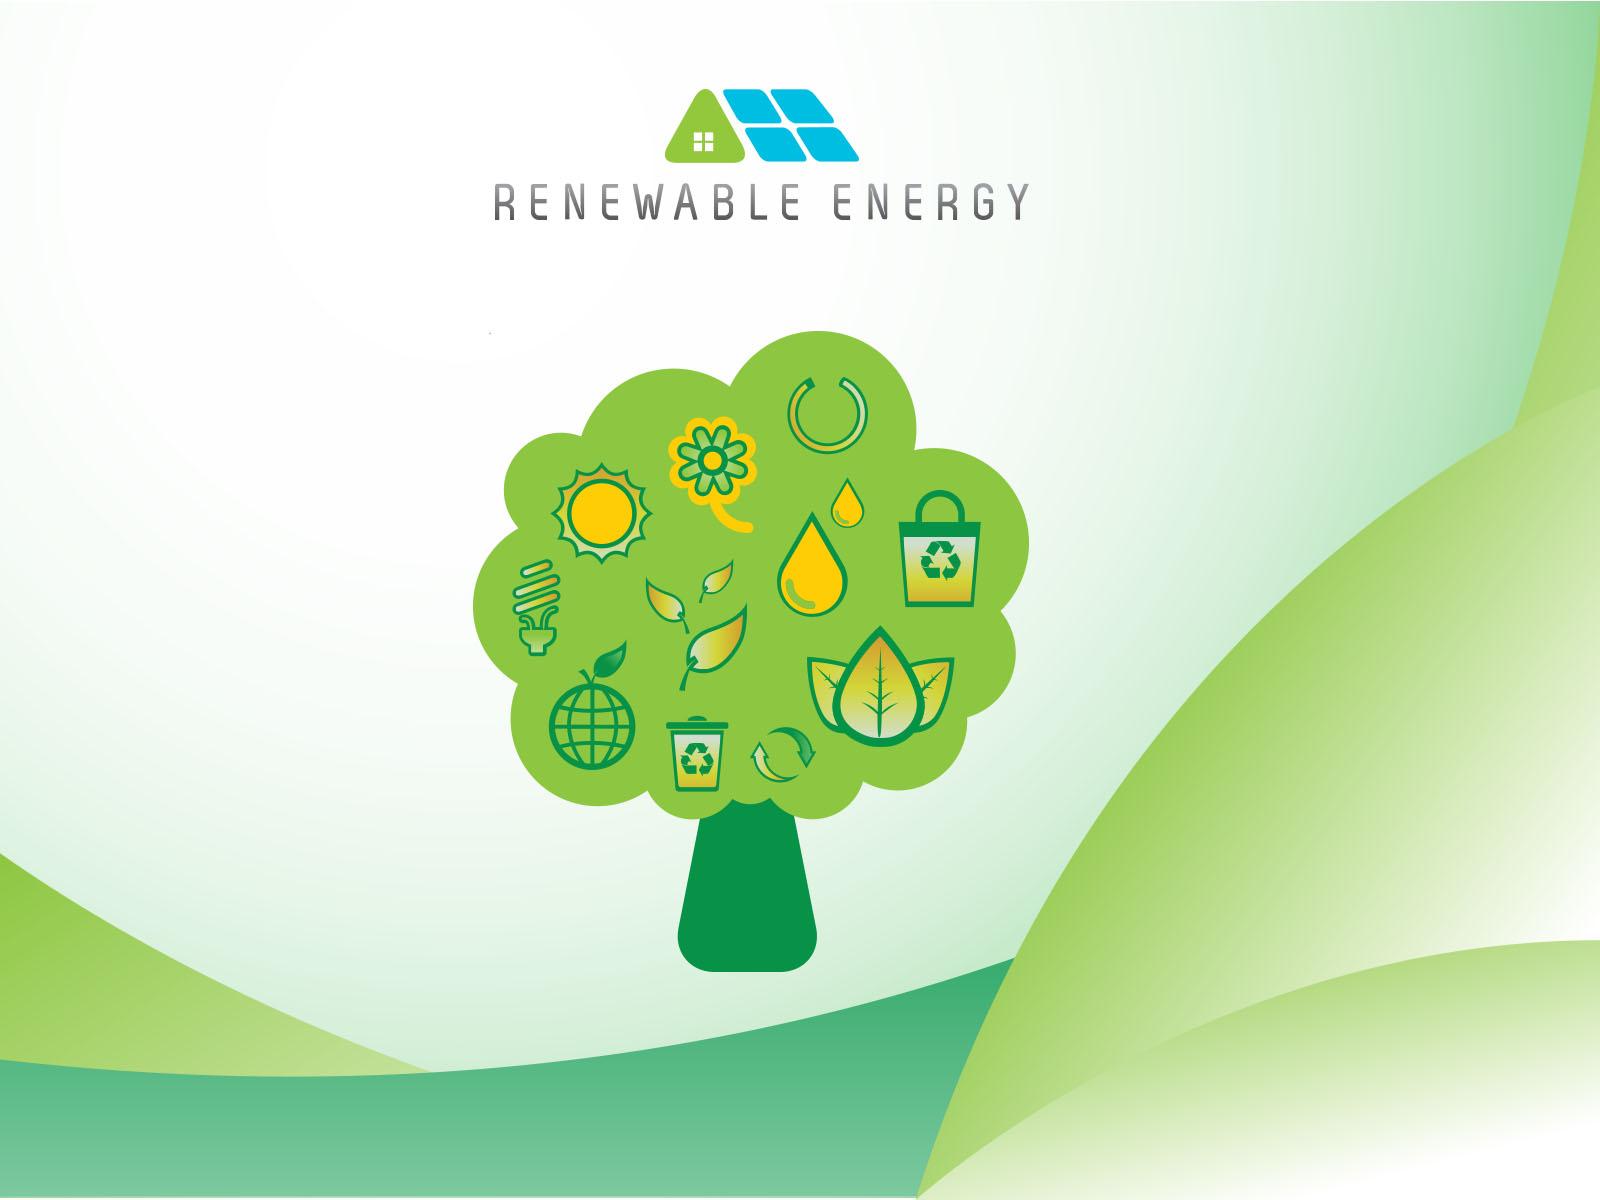 Renewable Energy PPT Background